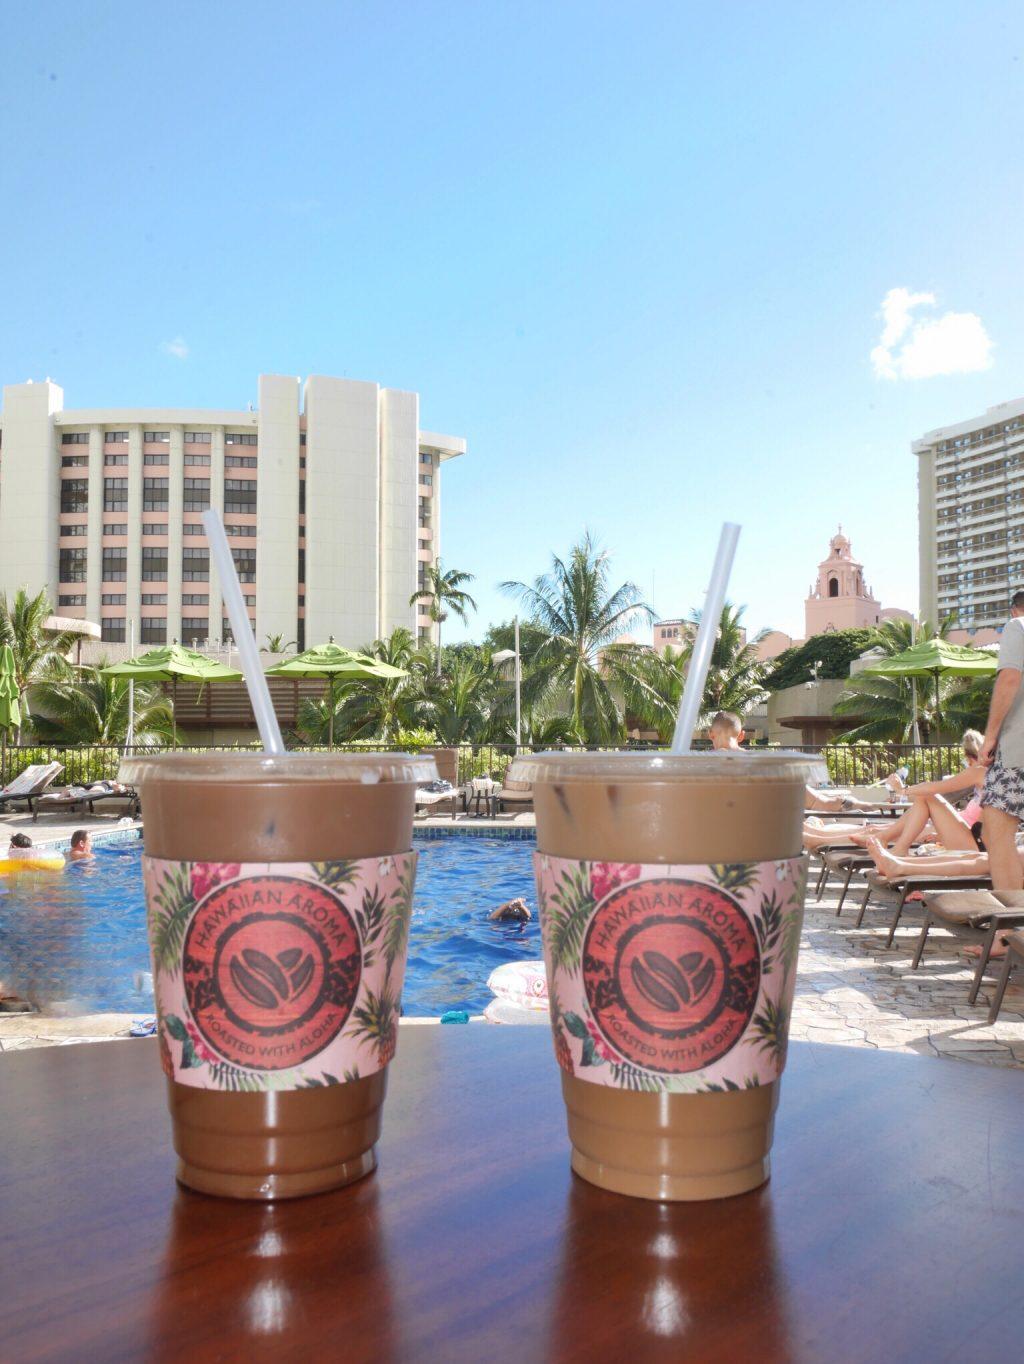 Hawaiian Aloma Cafe (ハワイアンアロマカフェ)